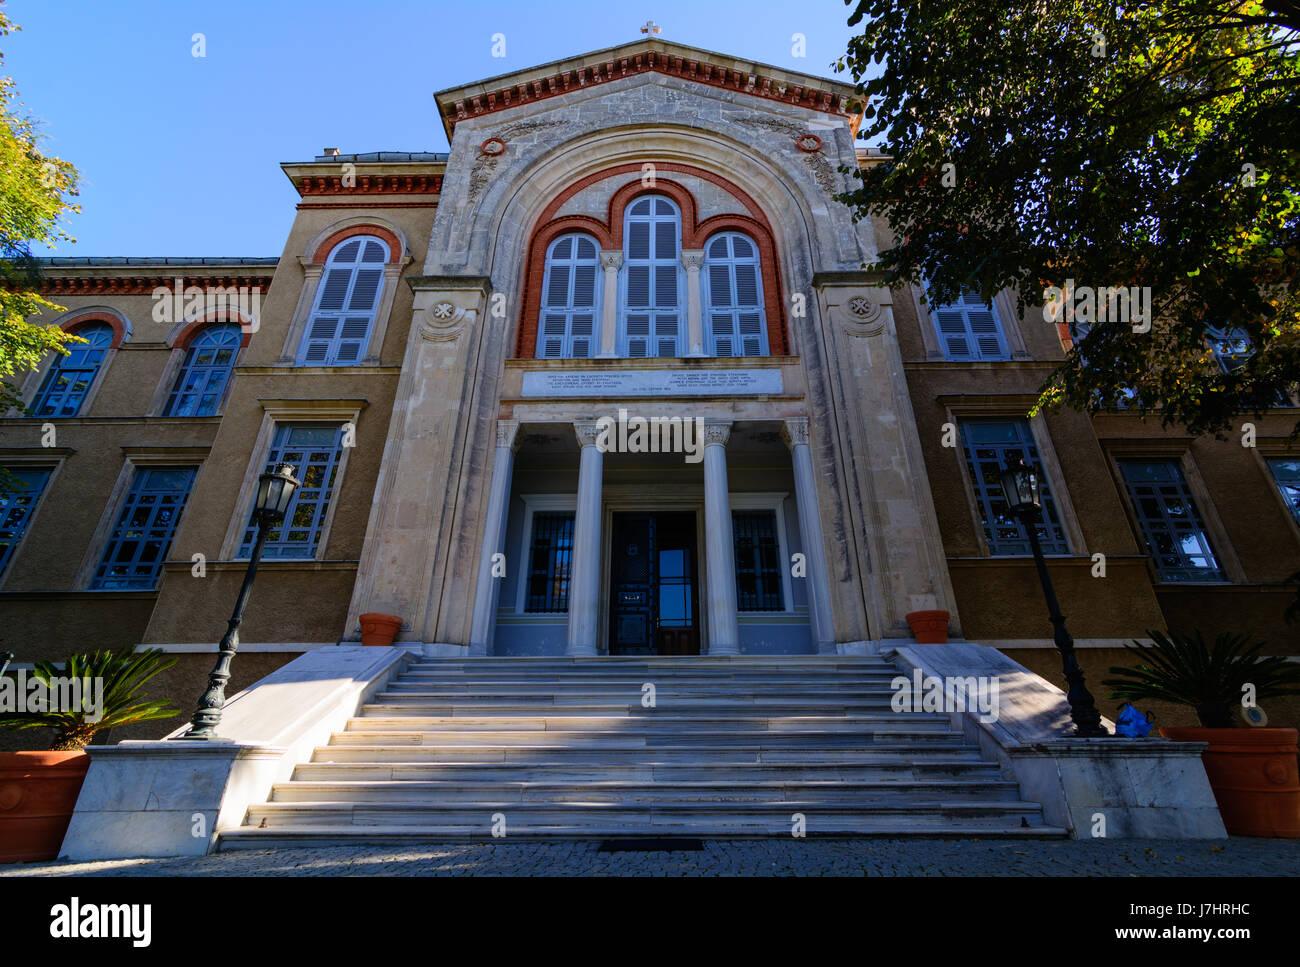 Halki Seminary, Theological School of Halki, Heybeliada Ruhban Okulu, Istanbul, Turkey - Stock Image